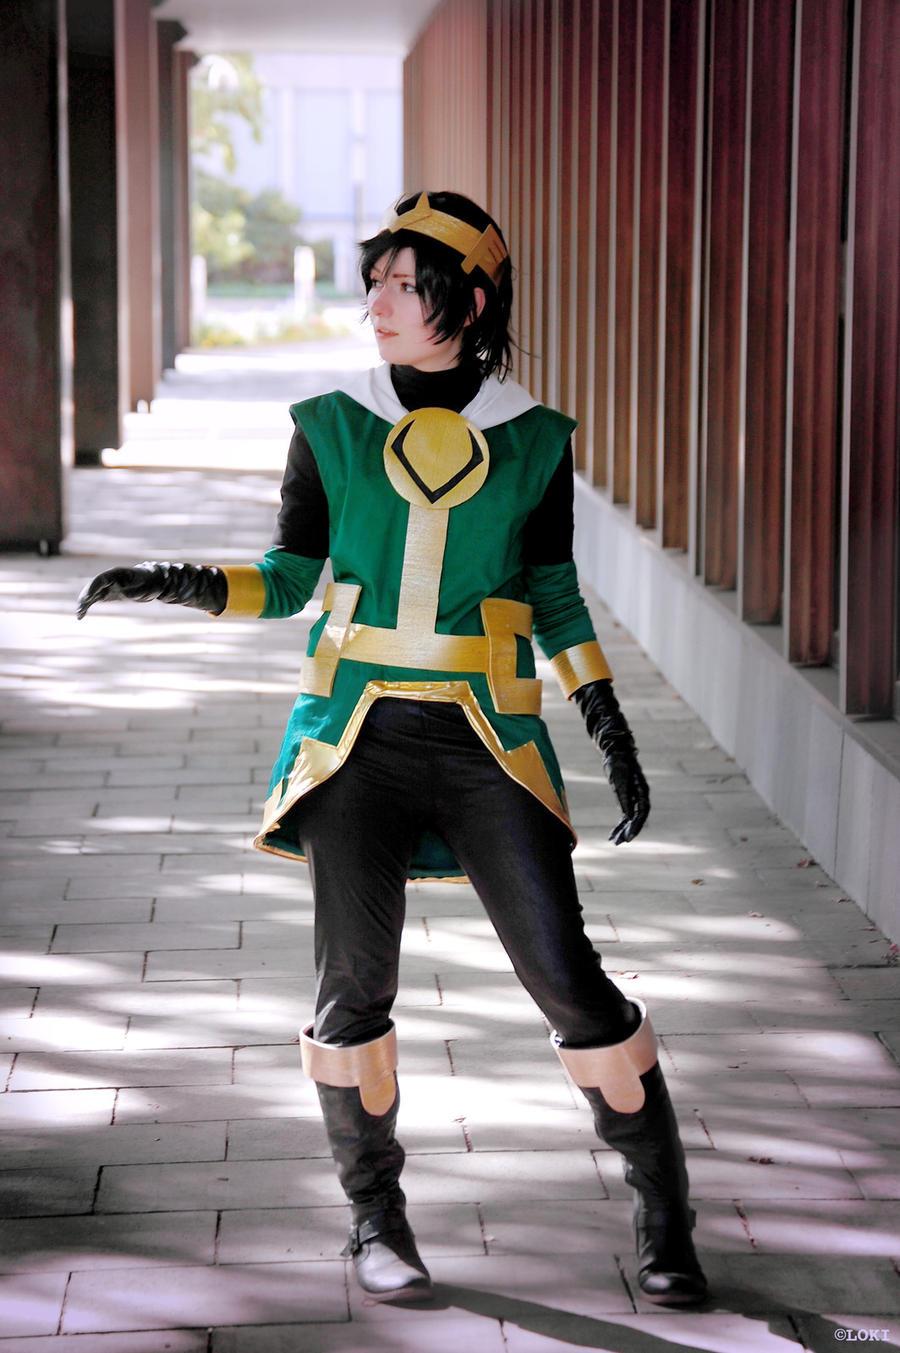 JOURNEY INTO MYSTERY Kid Loki 2 by itsL0KI